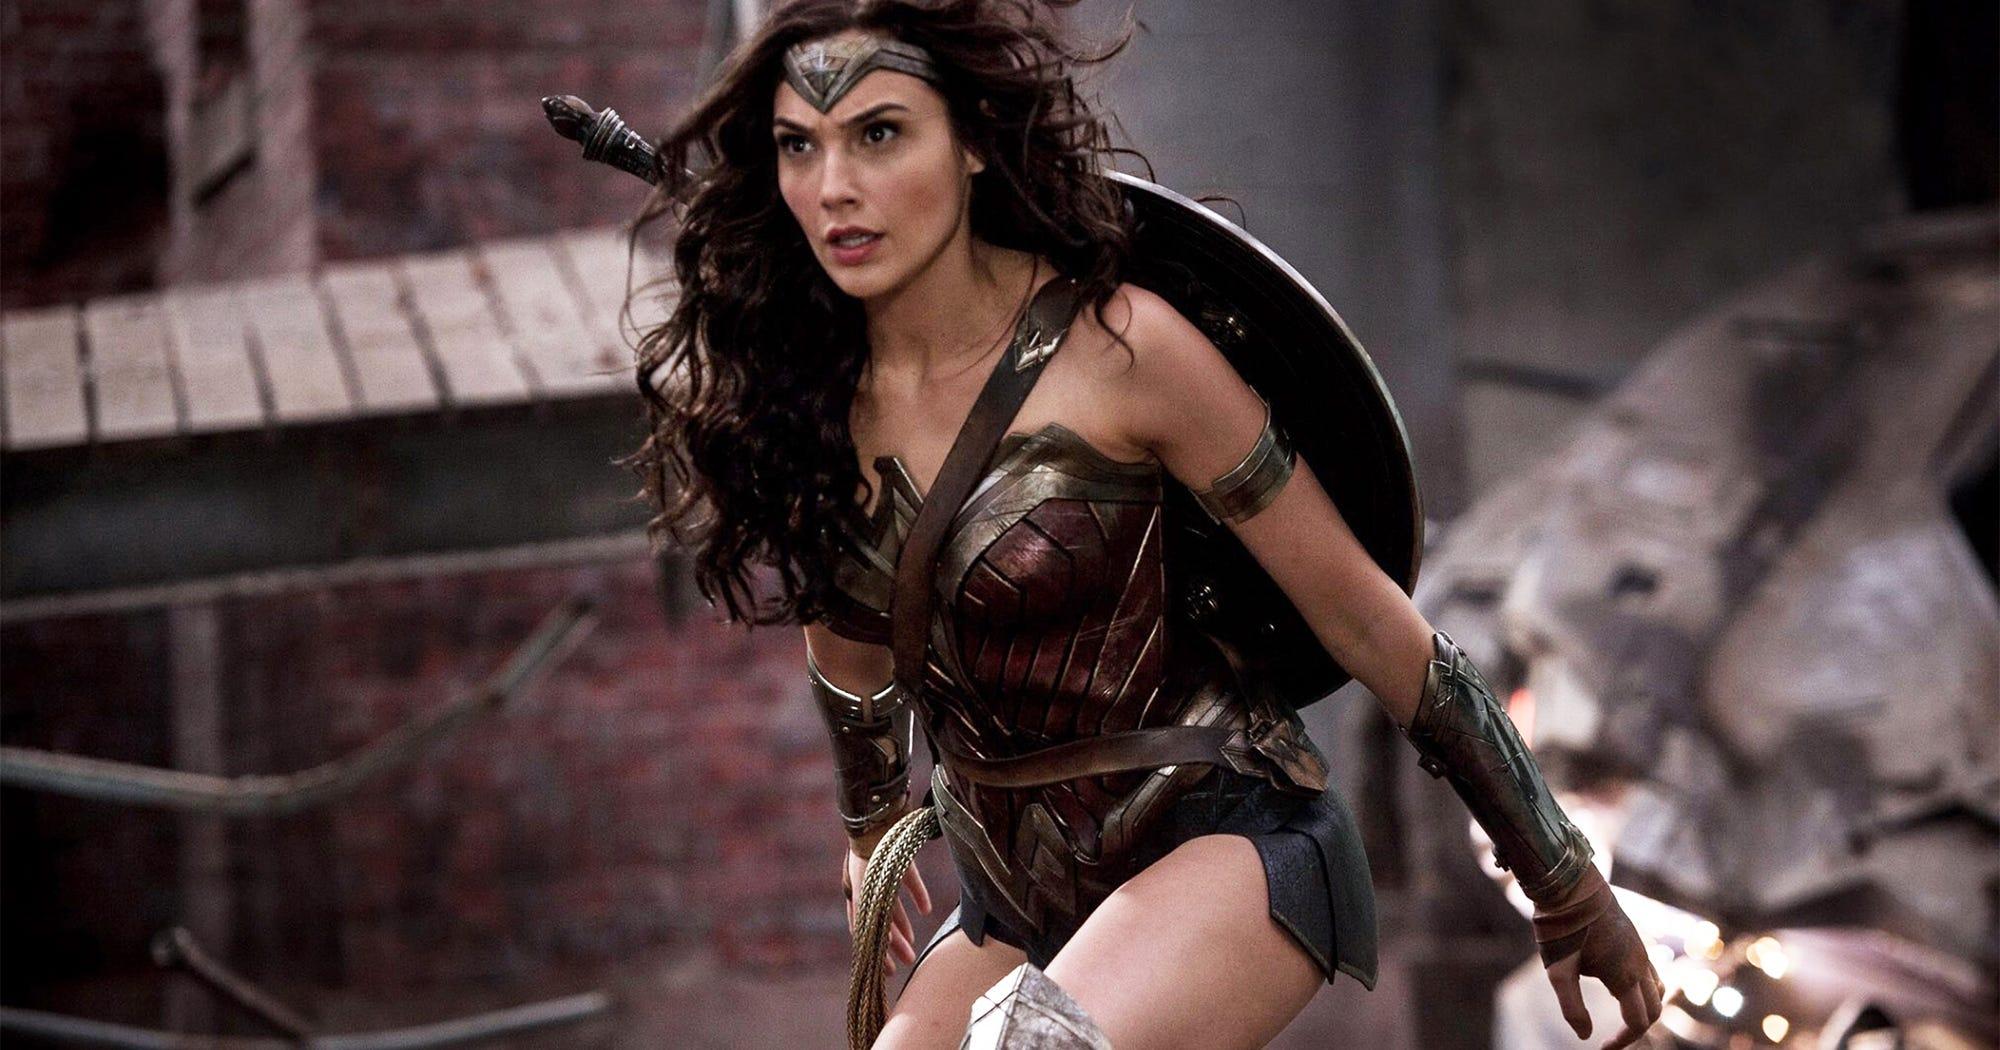 Wonder Woman Justice League Costume More Revealing